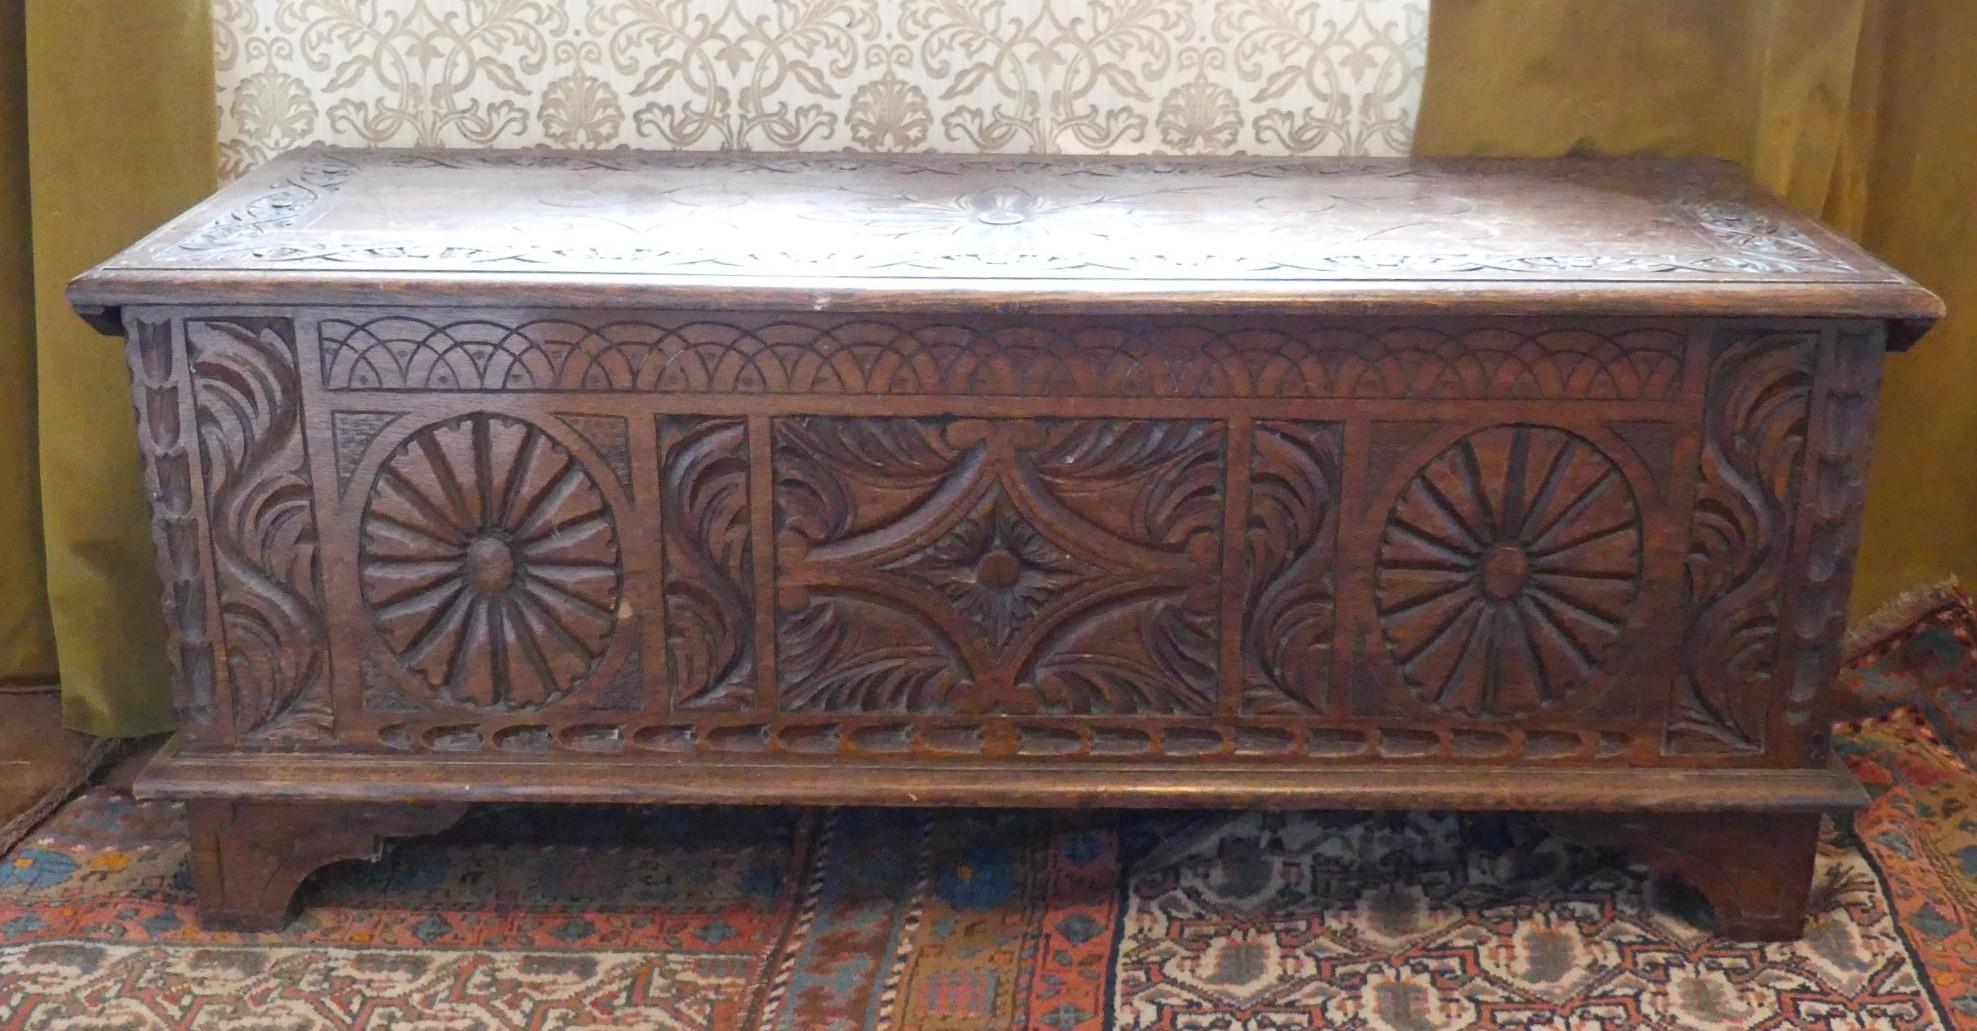 An antique carved oak Coffer, 47in (119.5cm) wide x 17½in (44.5cm) deep x 19½in (49.5cm) high.